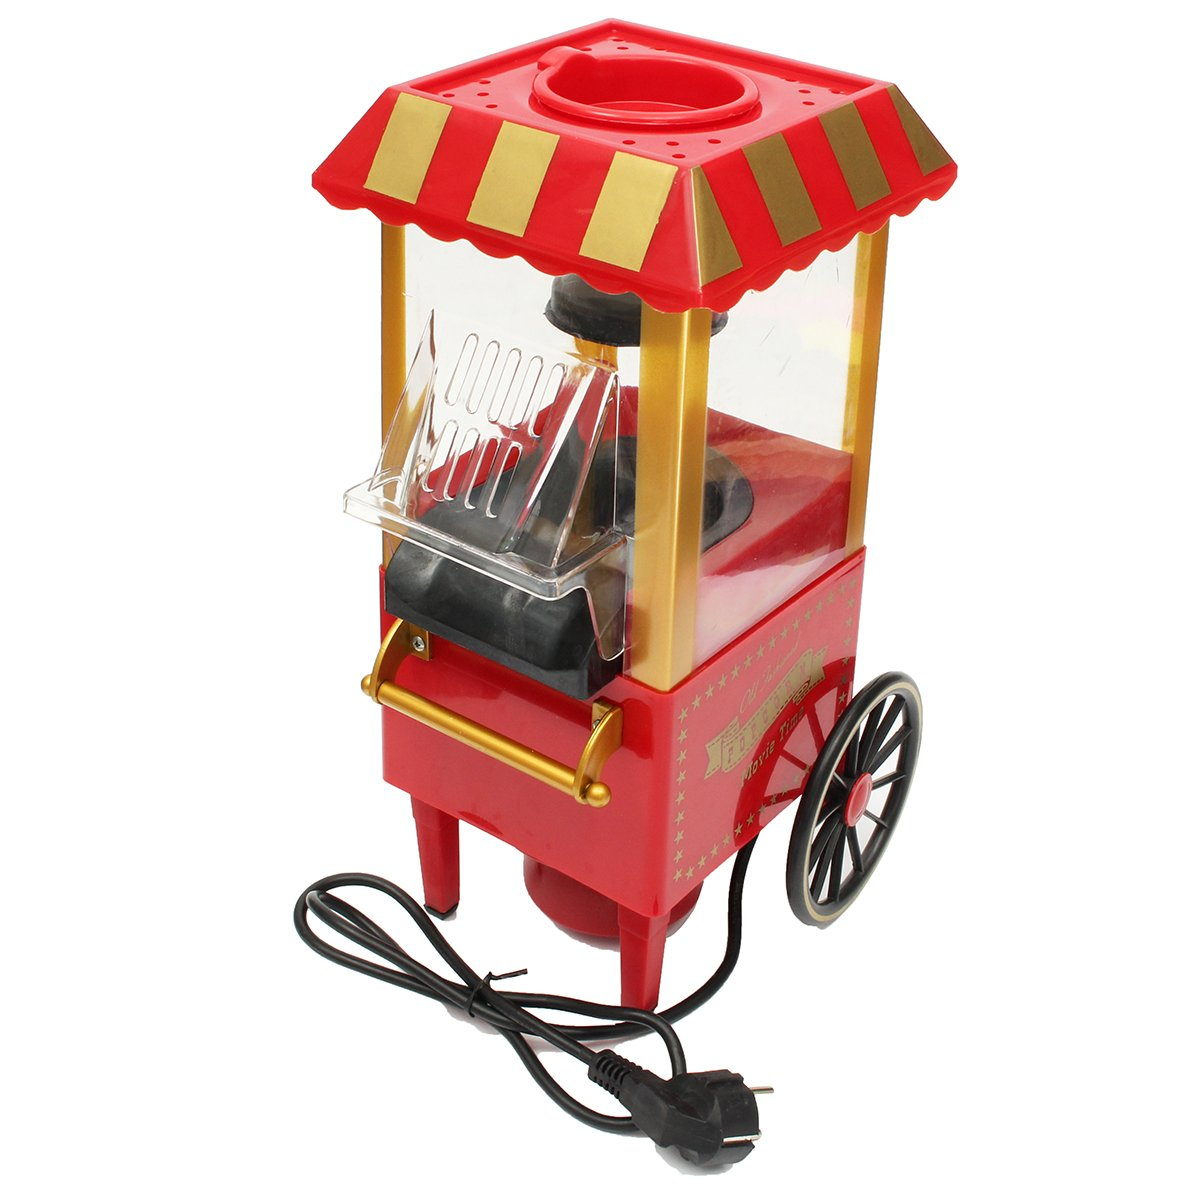 220V EU Plug Intage Retro Electric Popcorn Maker Popper Tabletop Machine